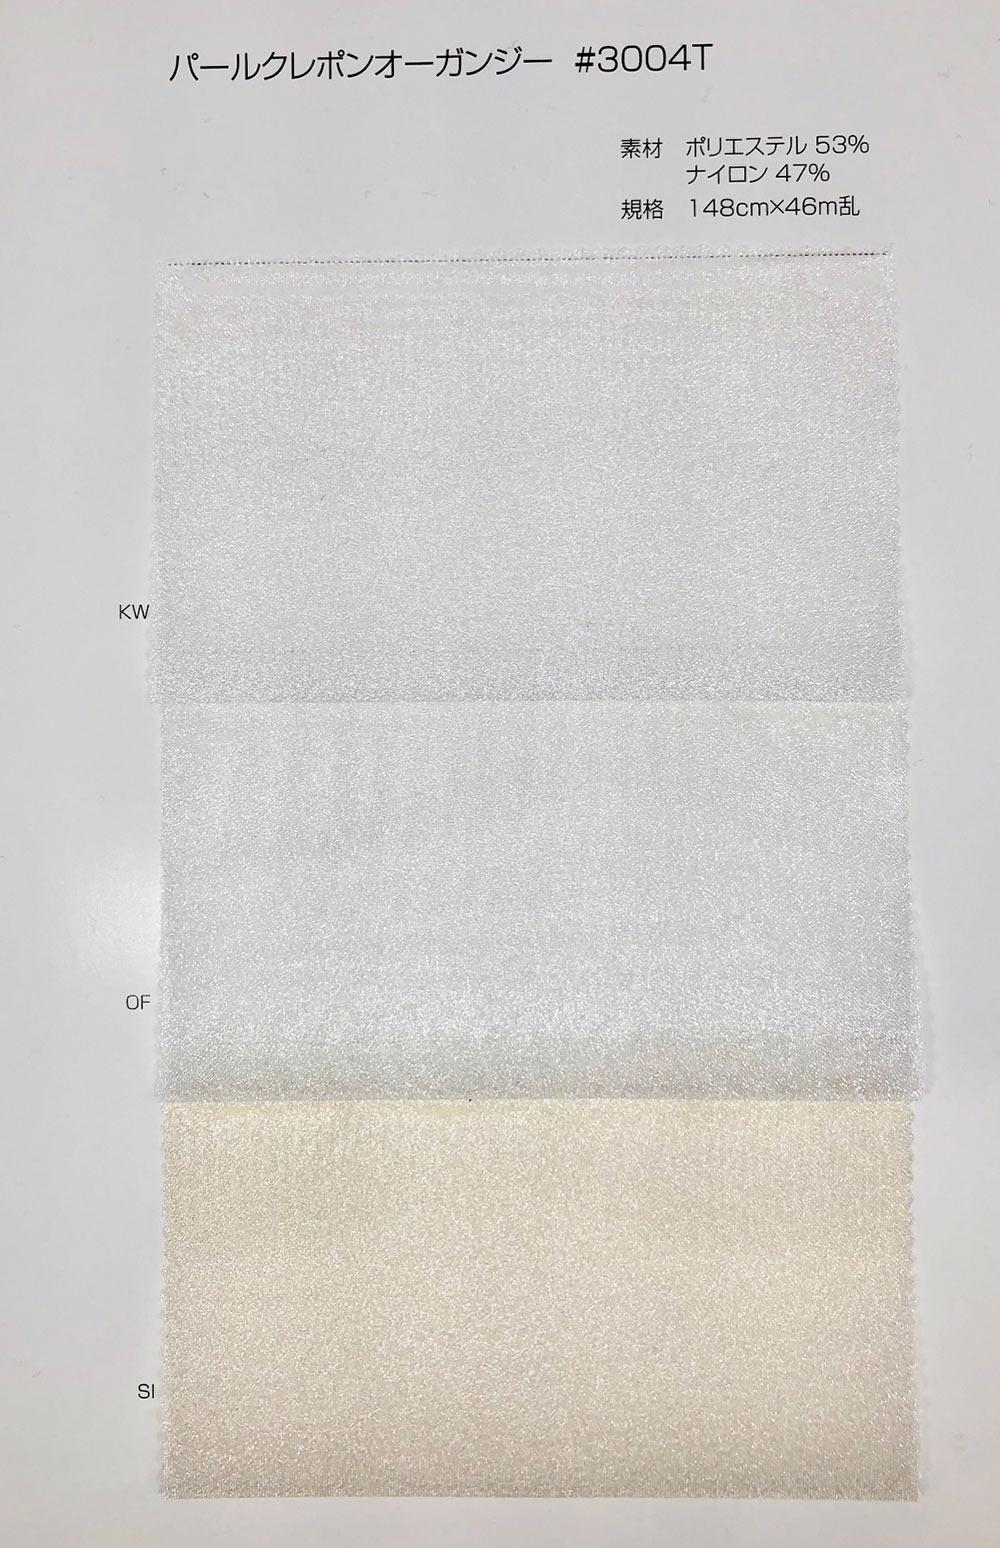 3004T パールクレポンオーガンジー[生地] サンコロナ小田/オークラ商事 - ApparelX アパレル資材卸通販